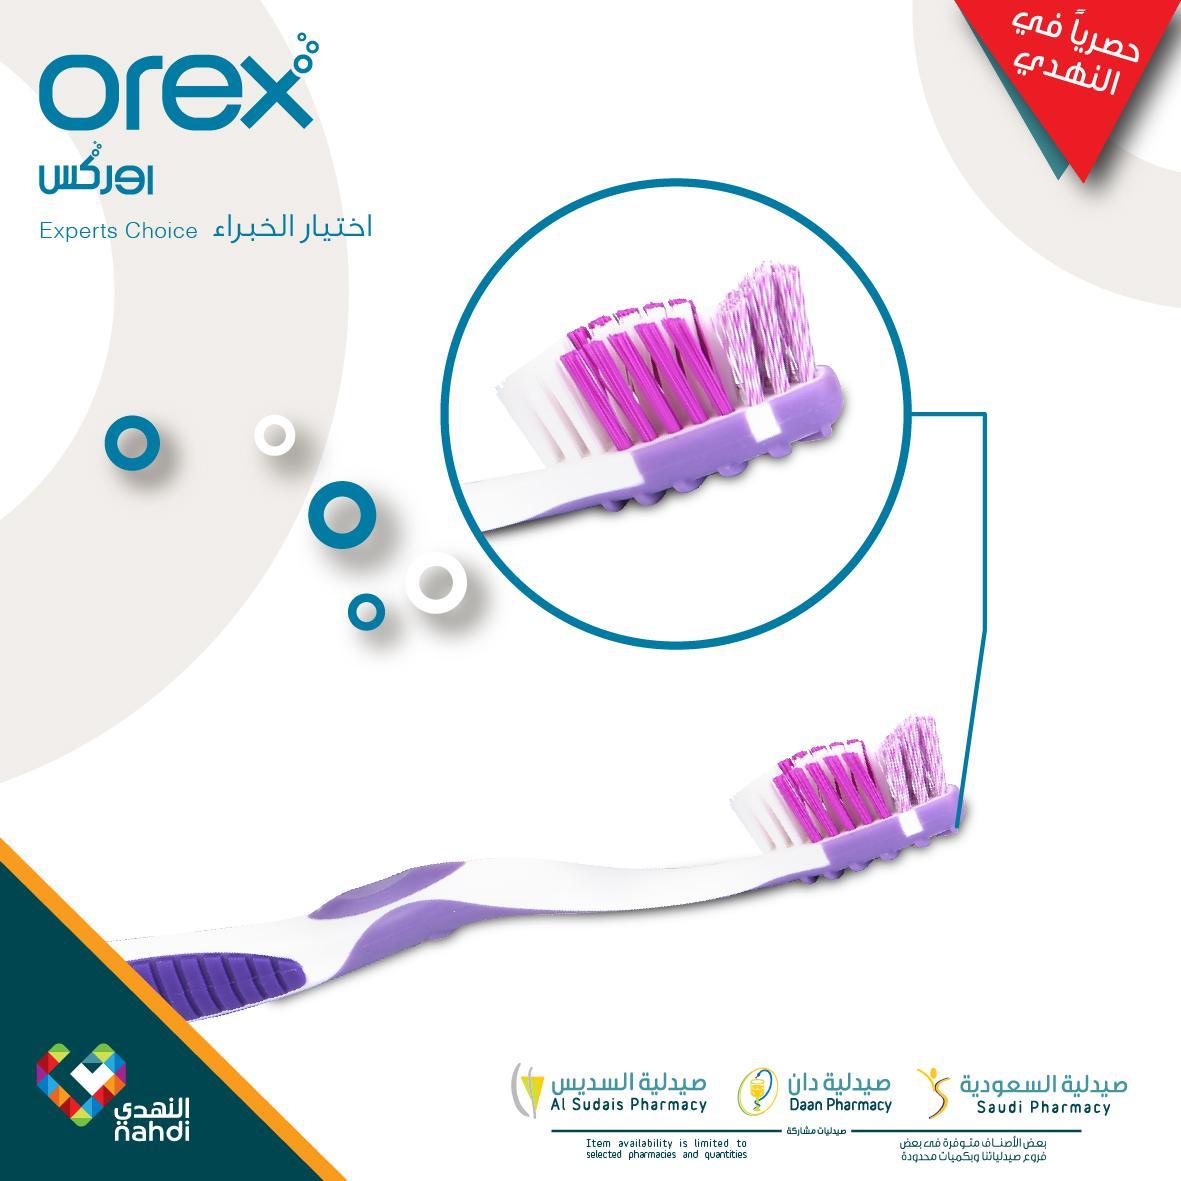 Nahdihope Auf Twitter هل تعلم أن تنظيف اللسان مهم جدا للمحافظة على صحة الفم وفرشاة أوركس تقدم لك هذه الخاصية في أكثر الأشكال جاذبية Http T Co Gssr9v5wr7